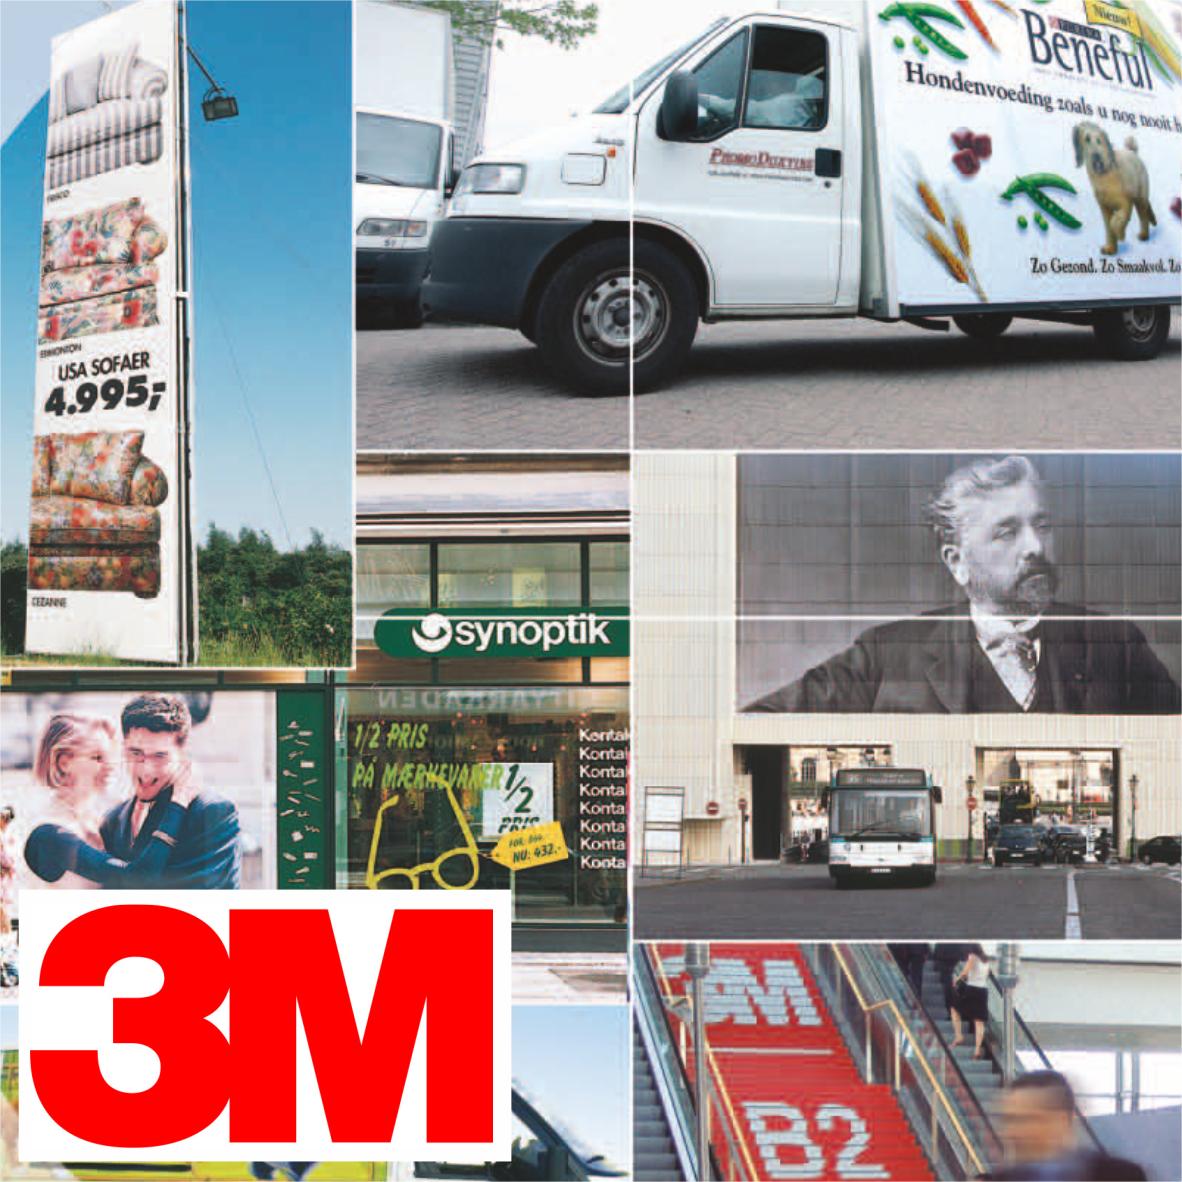 Svært 3M Envision SV 480 Cv3 Print Wrap - 25 Lfm   Werbetechniker-Shop MH-83